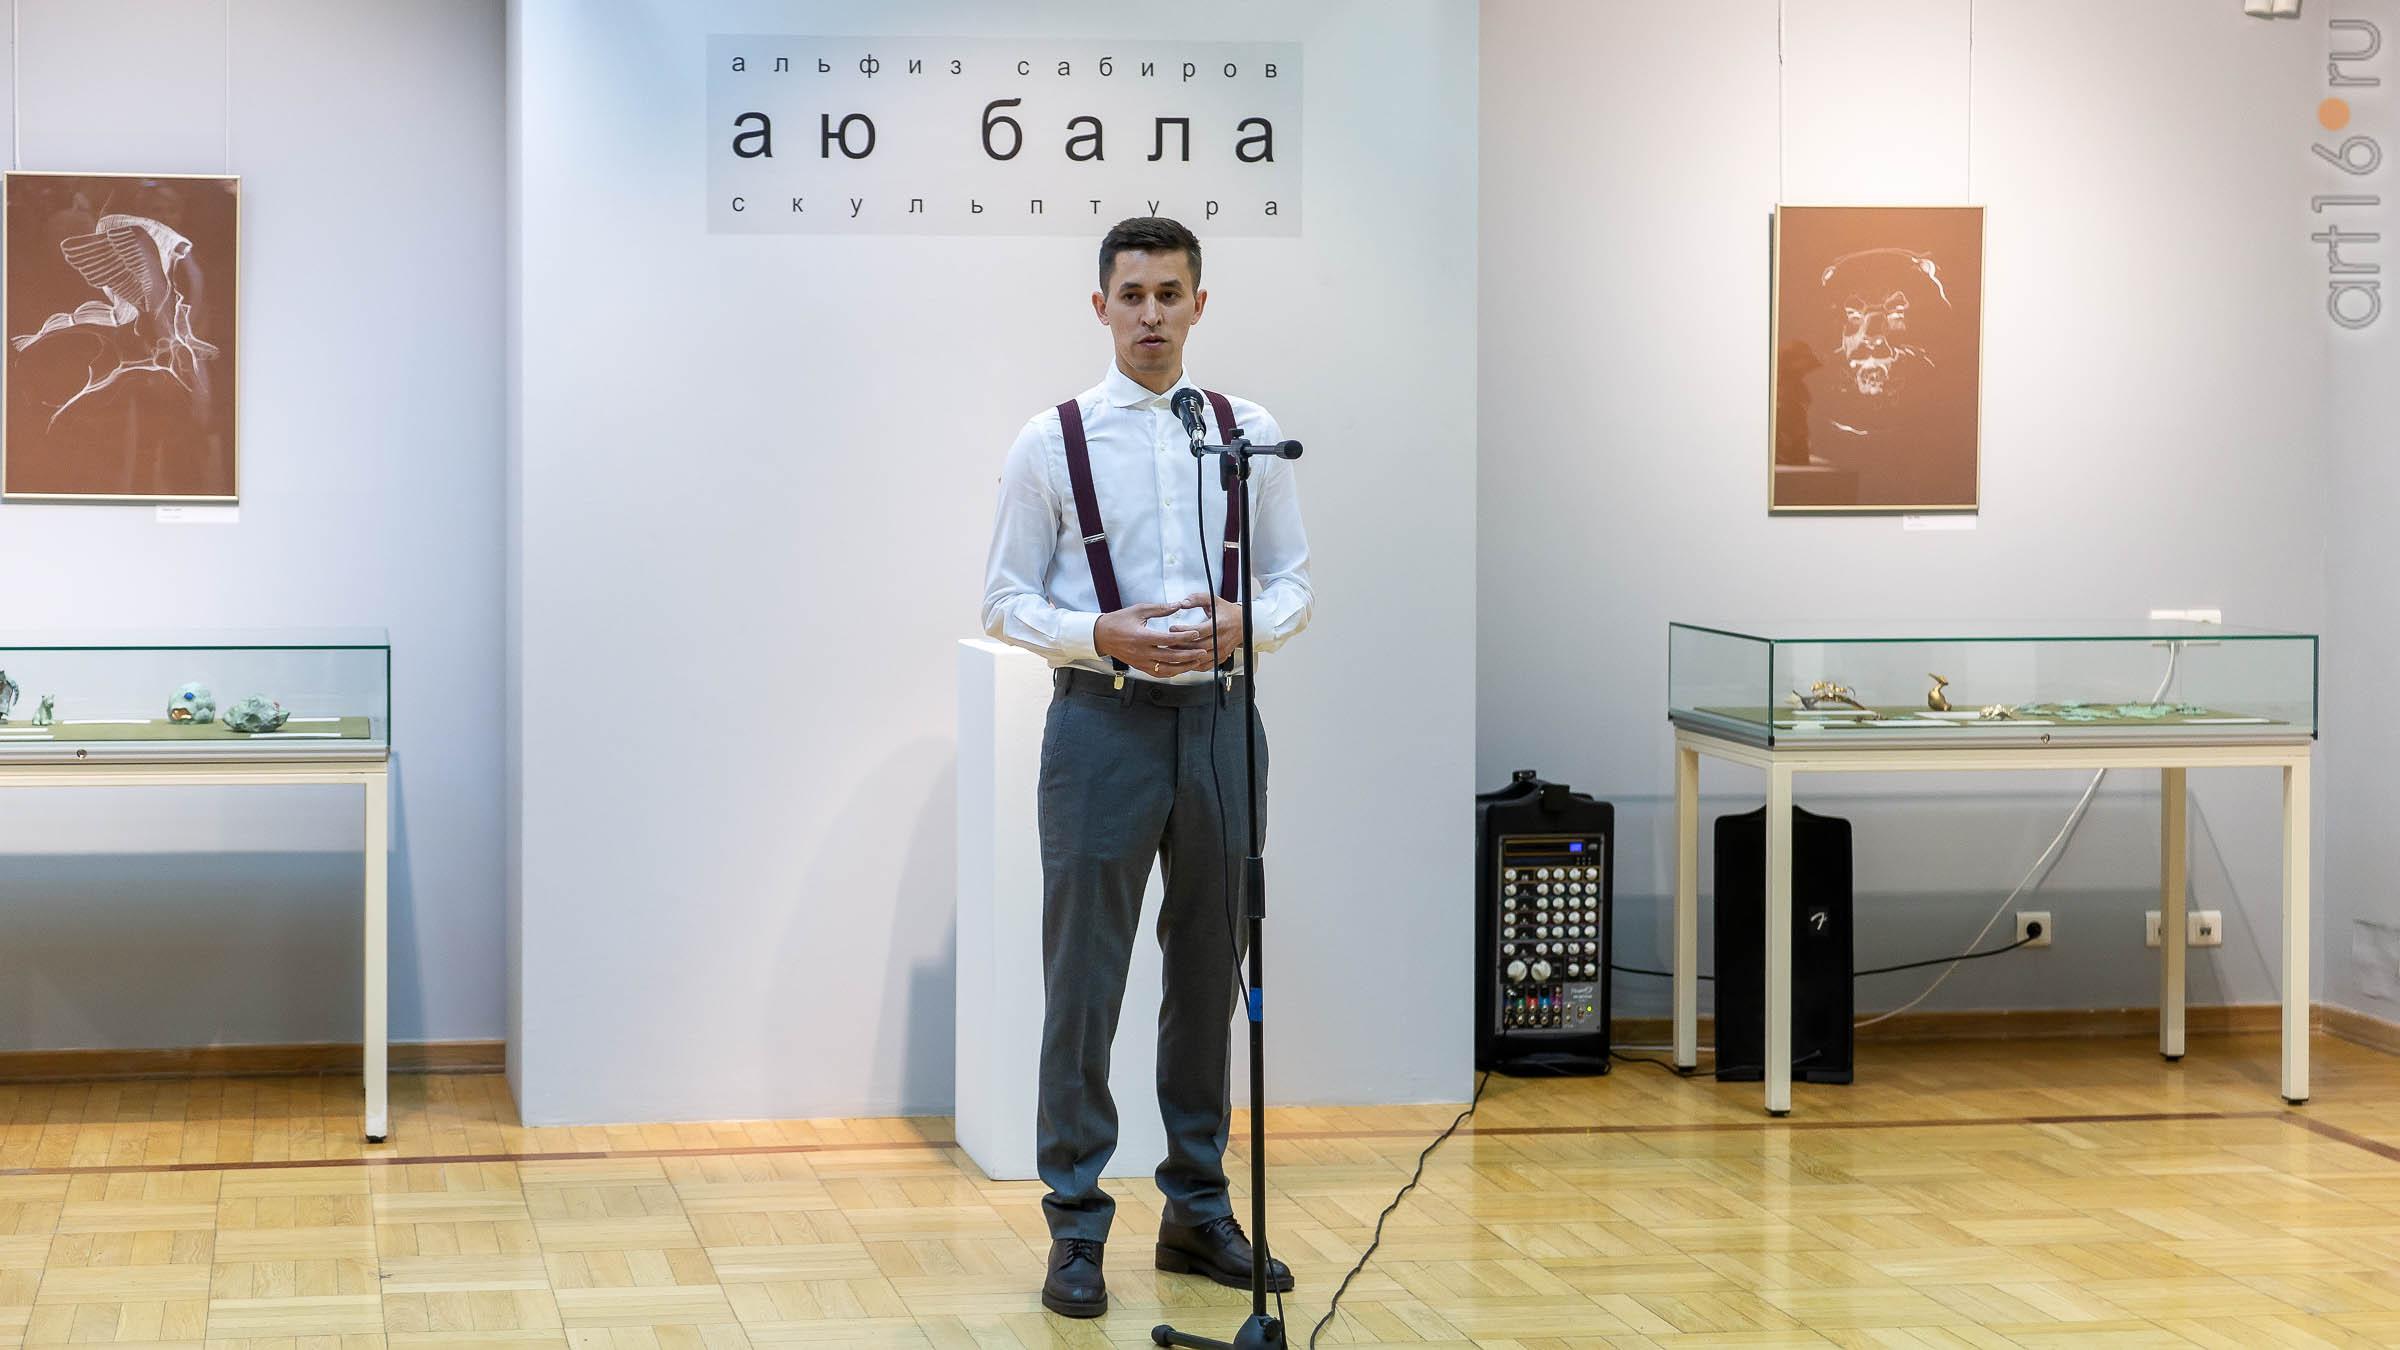 Сабиров Альфиз::Аю бала. Сабиров Альфиз. Выставка